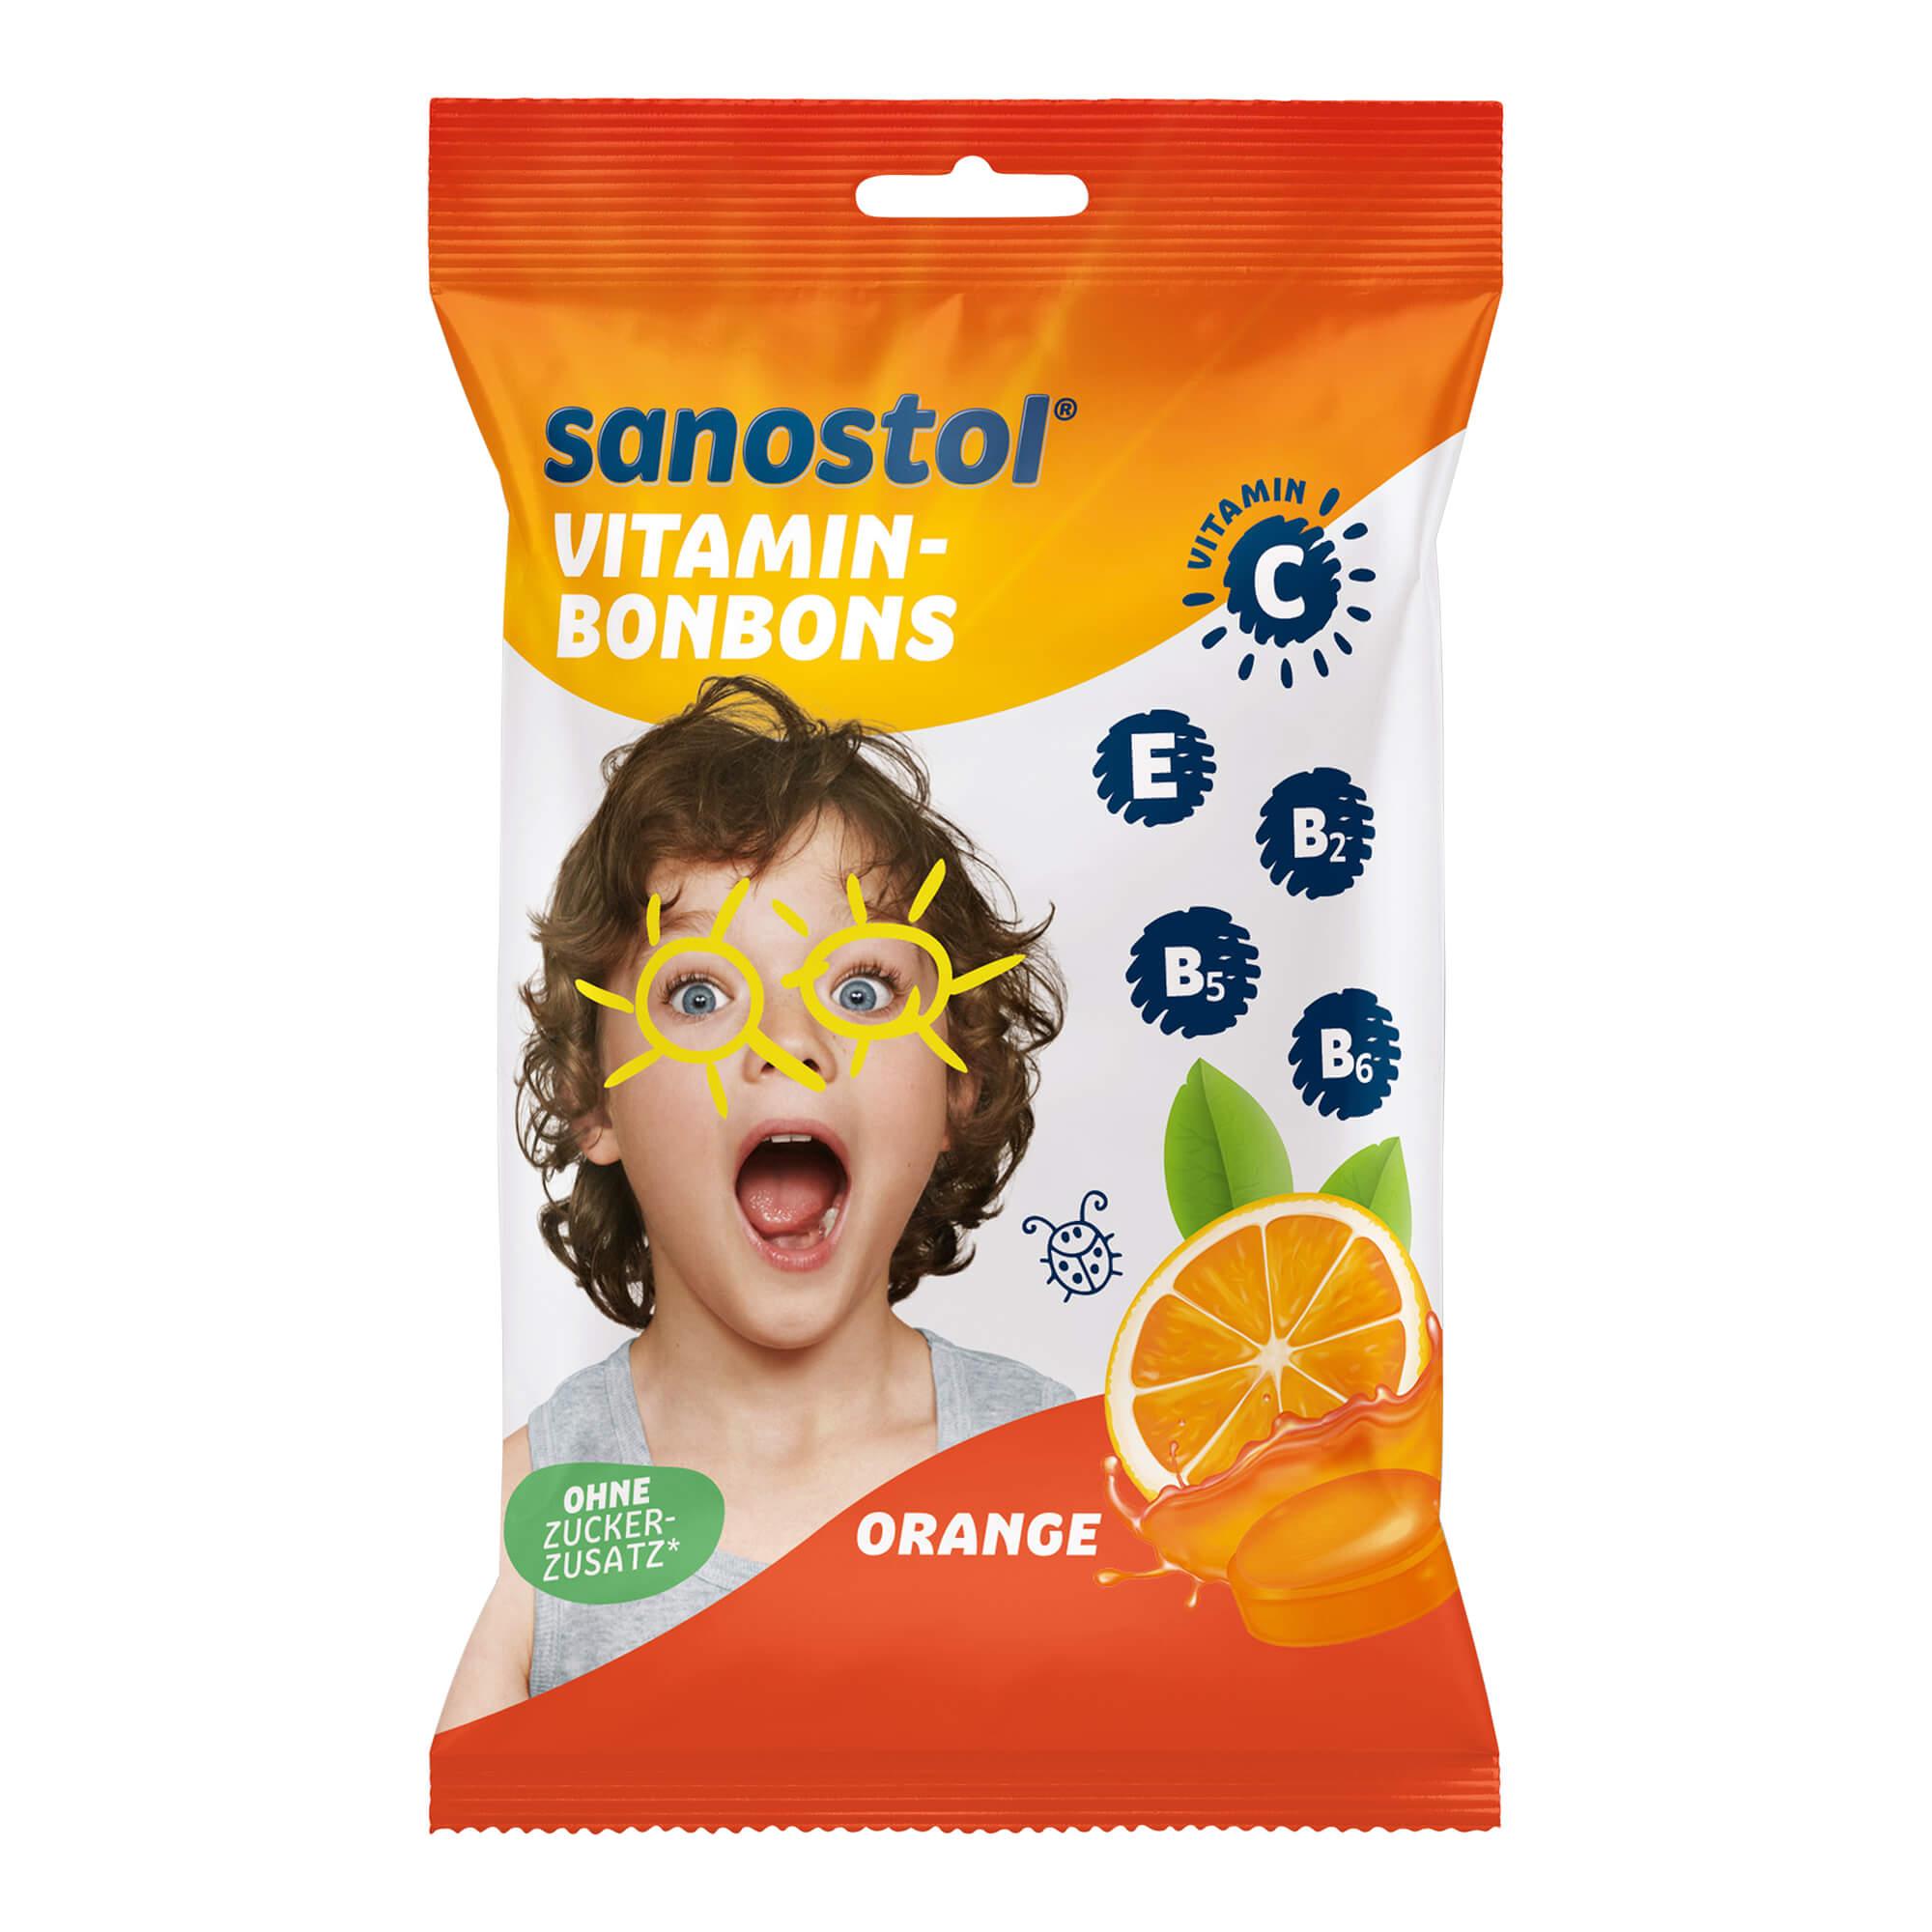 Sanostol Vitaminbonbons Orange